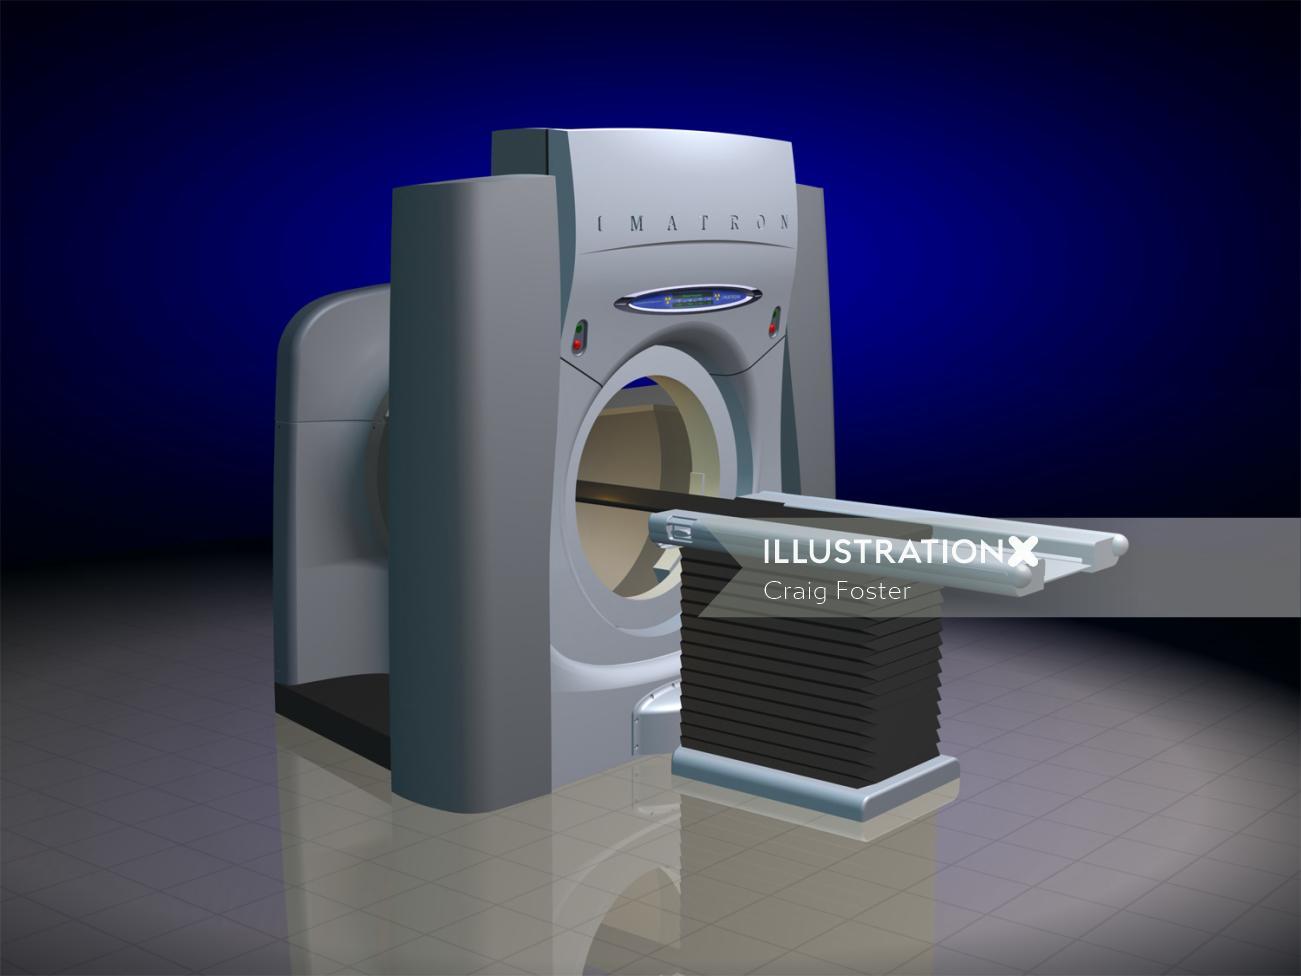 An illustration of CT Scanner machine